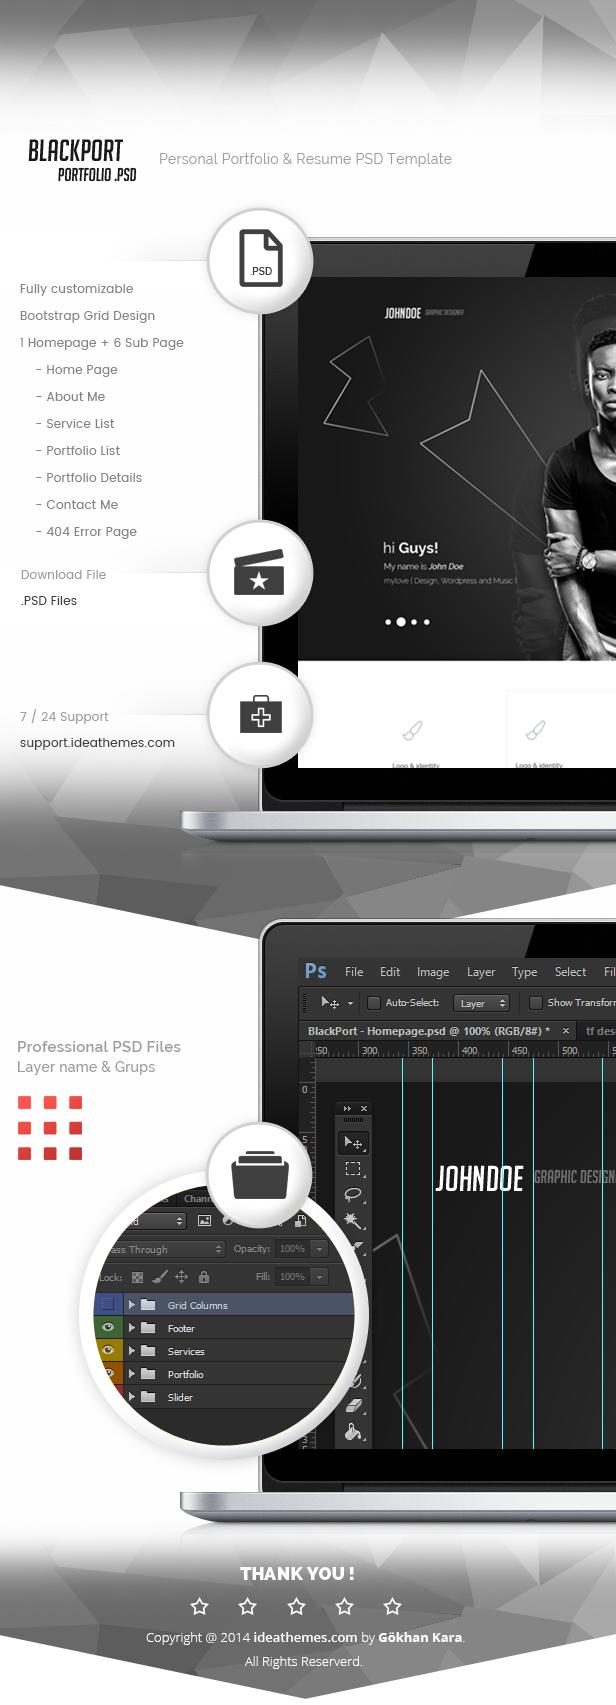 BlackPort - Personal Portfolio & Resume PSD Template - 1